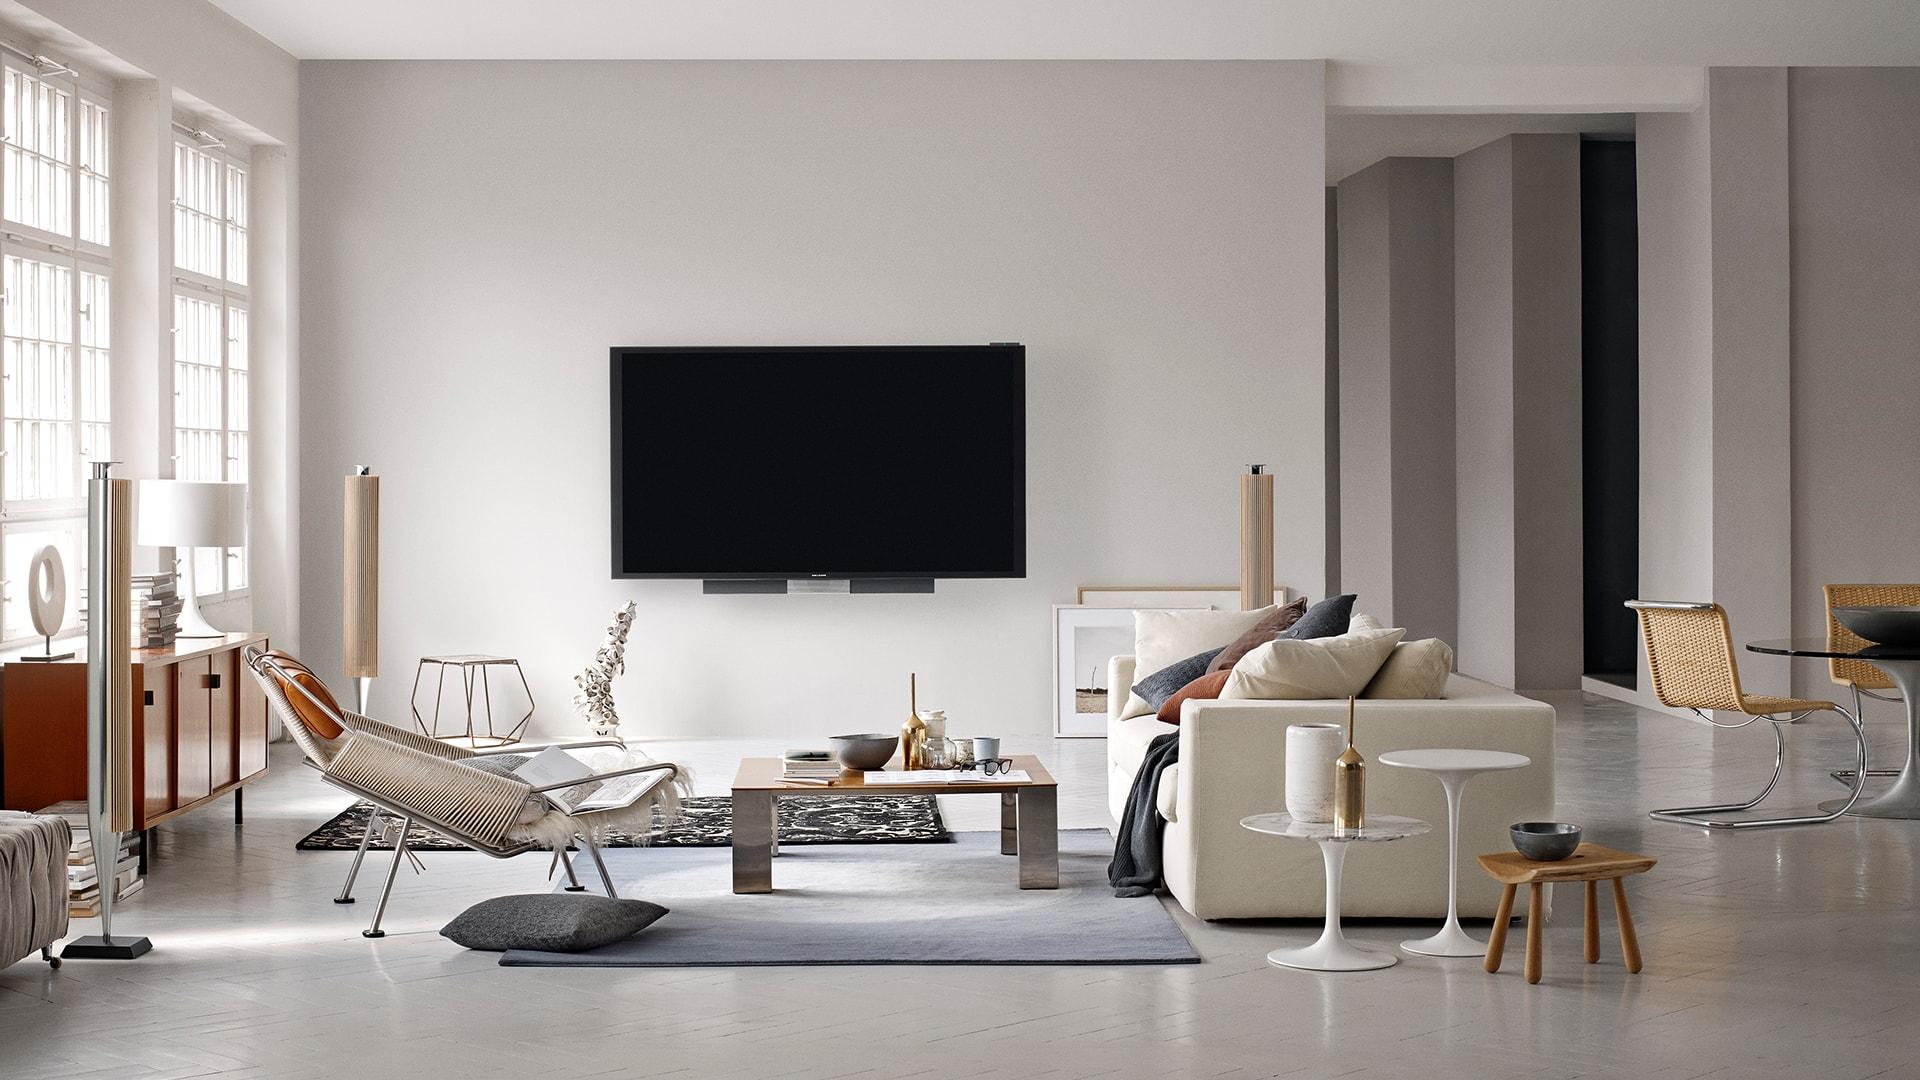 exklusive m bel aus hannover denken sie in farbe. Black Bedroom Furniture Sets. Home Design Ideas